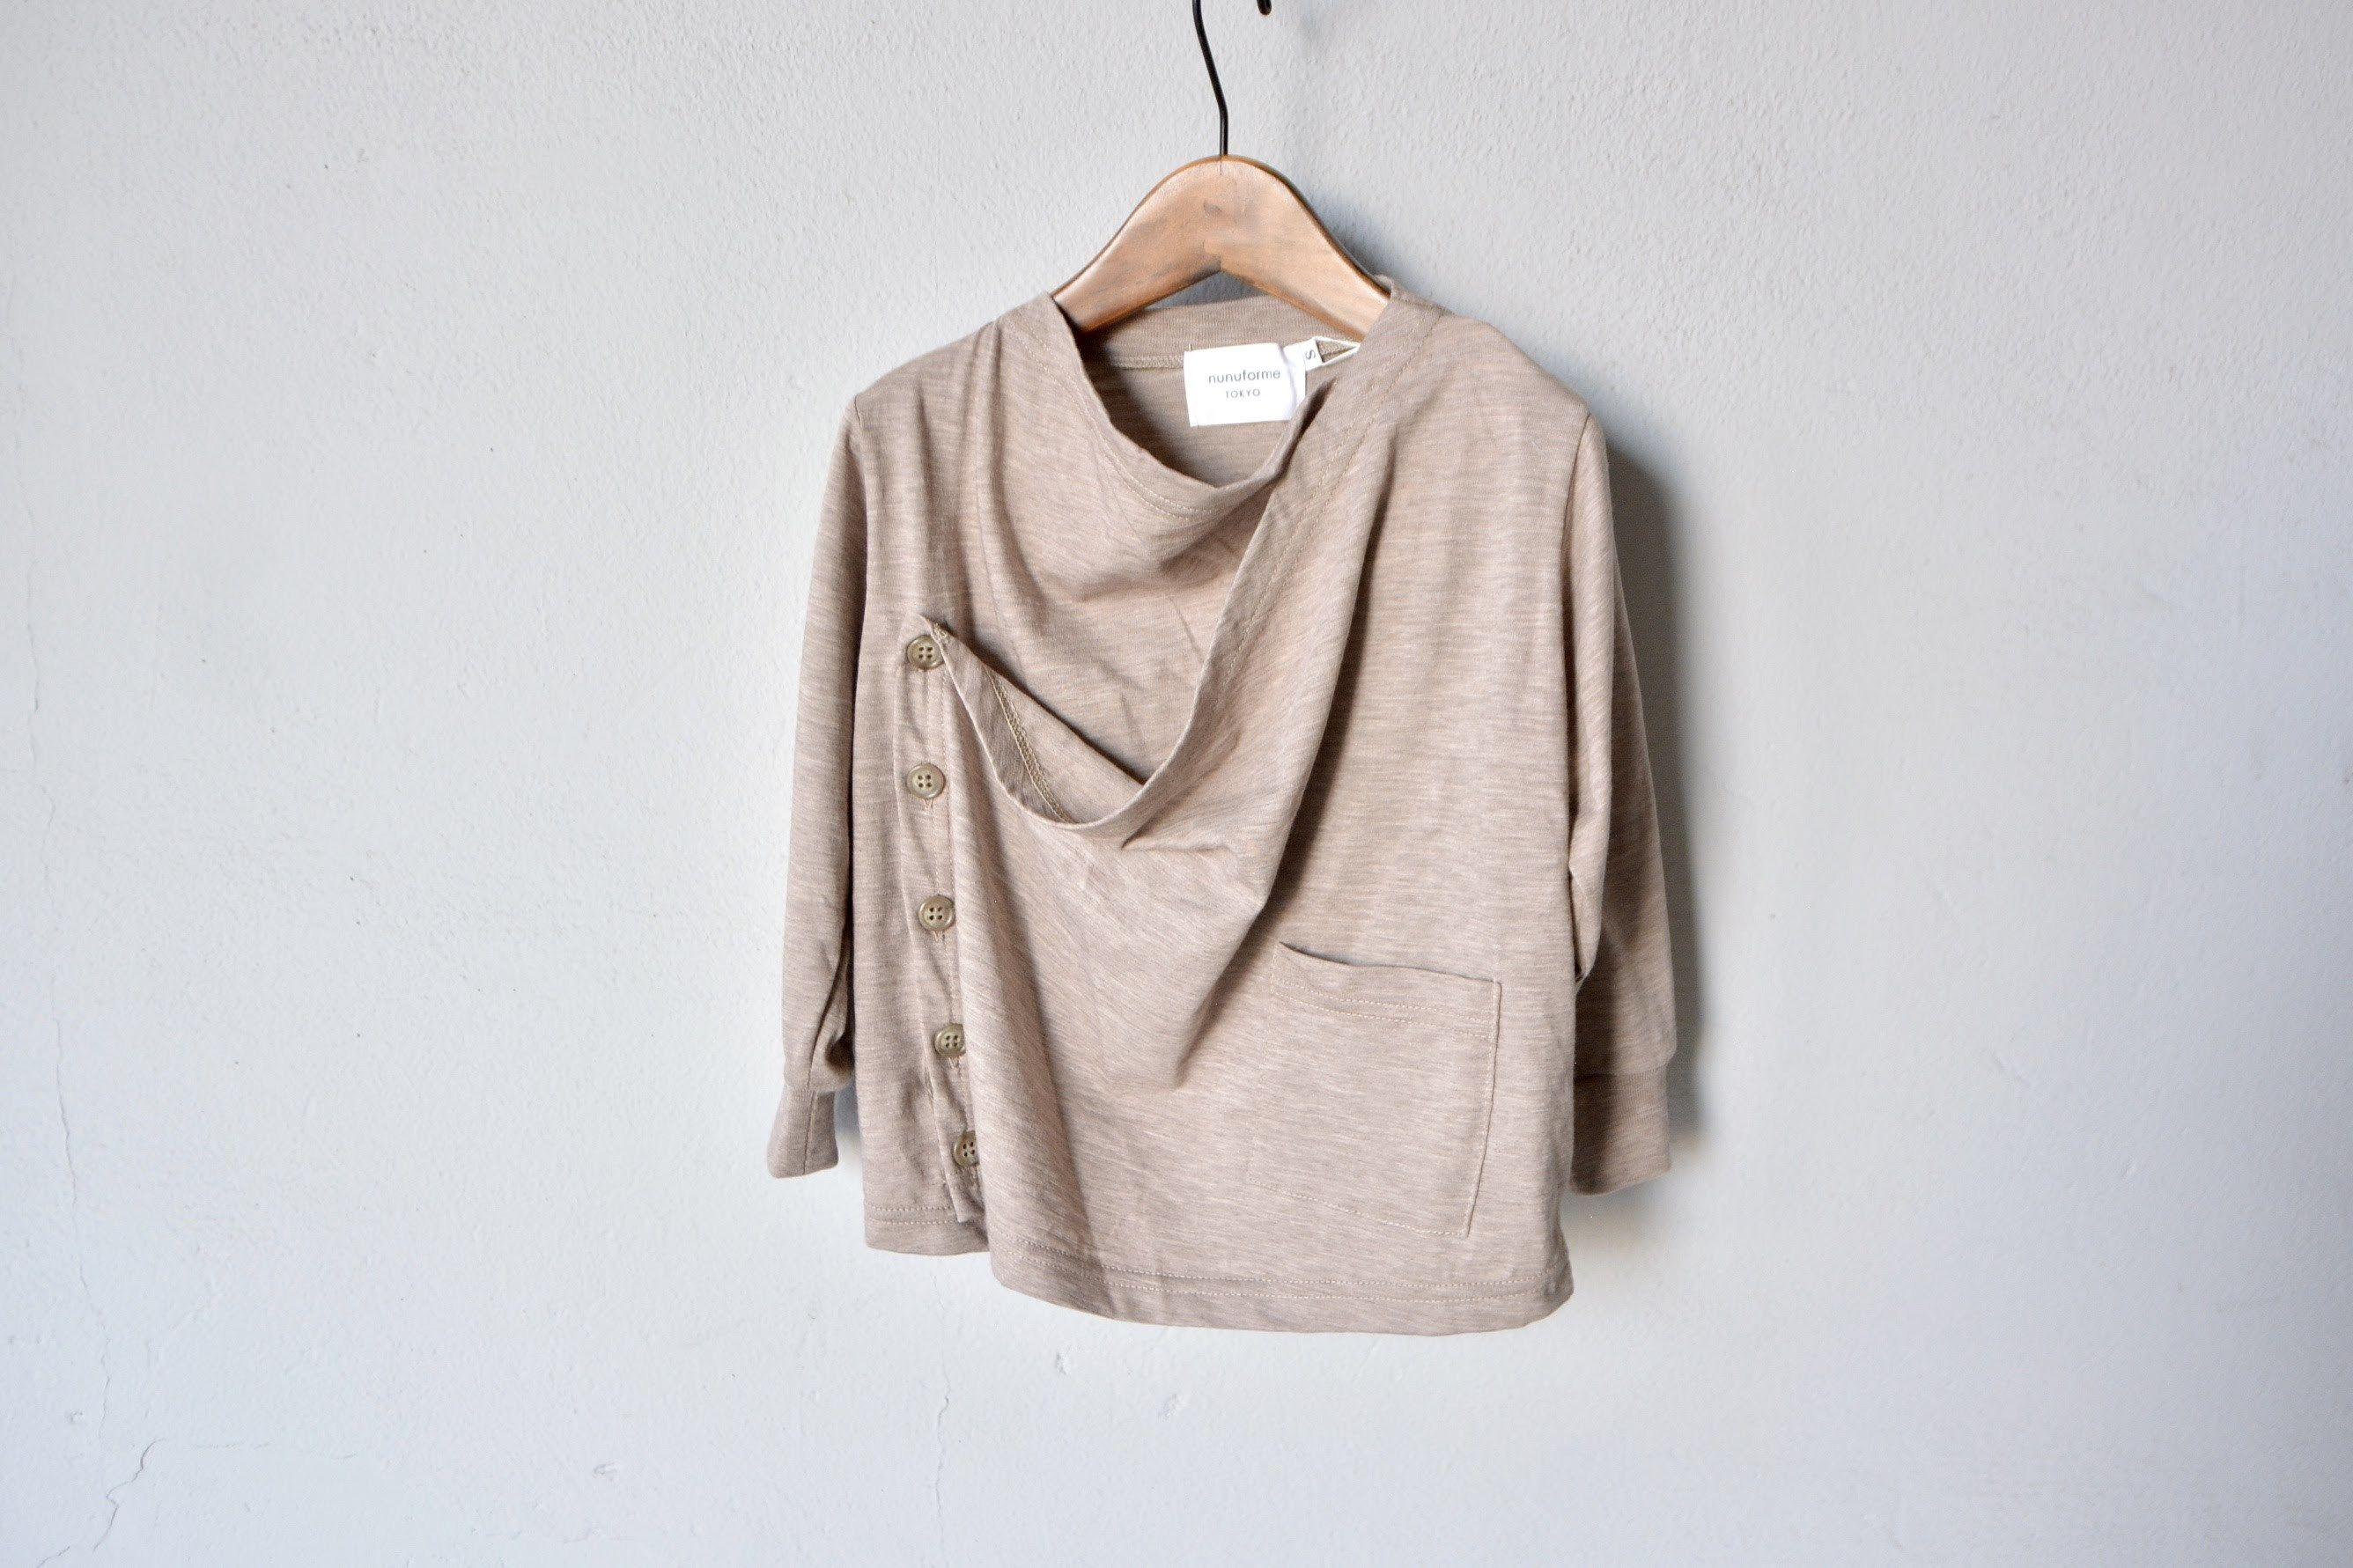 【 nunu forme 18SS 】 ドレープカーディガン (~145cm)/ beige